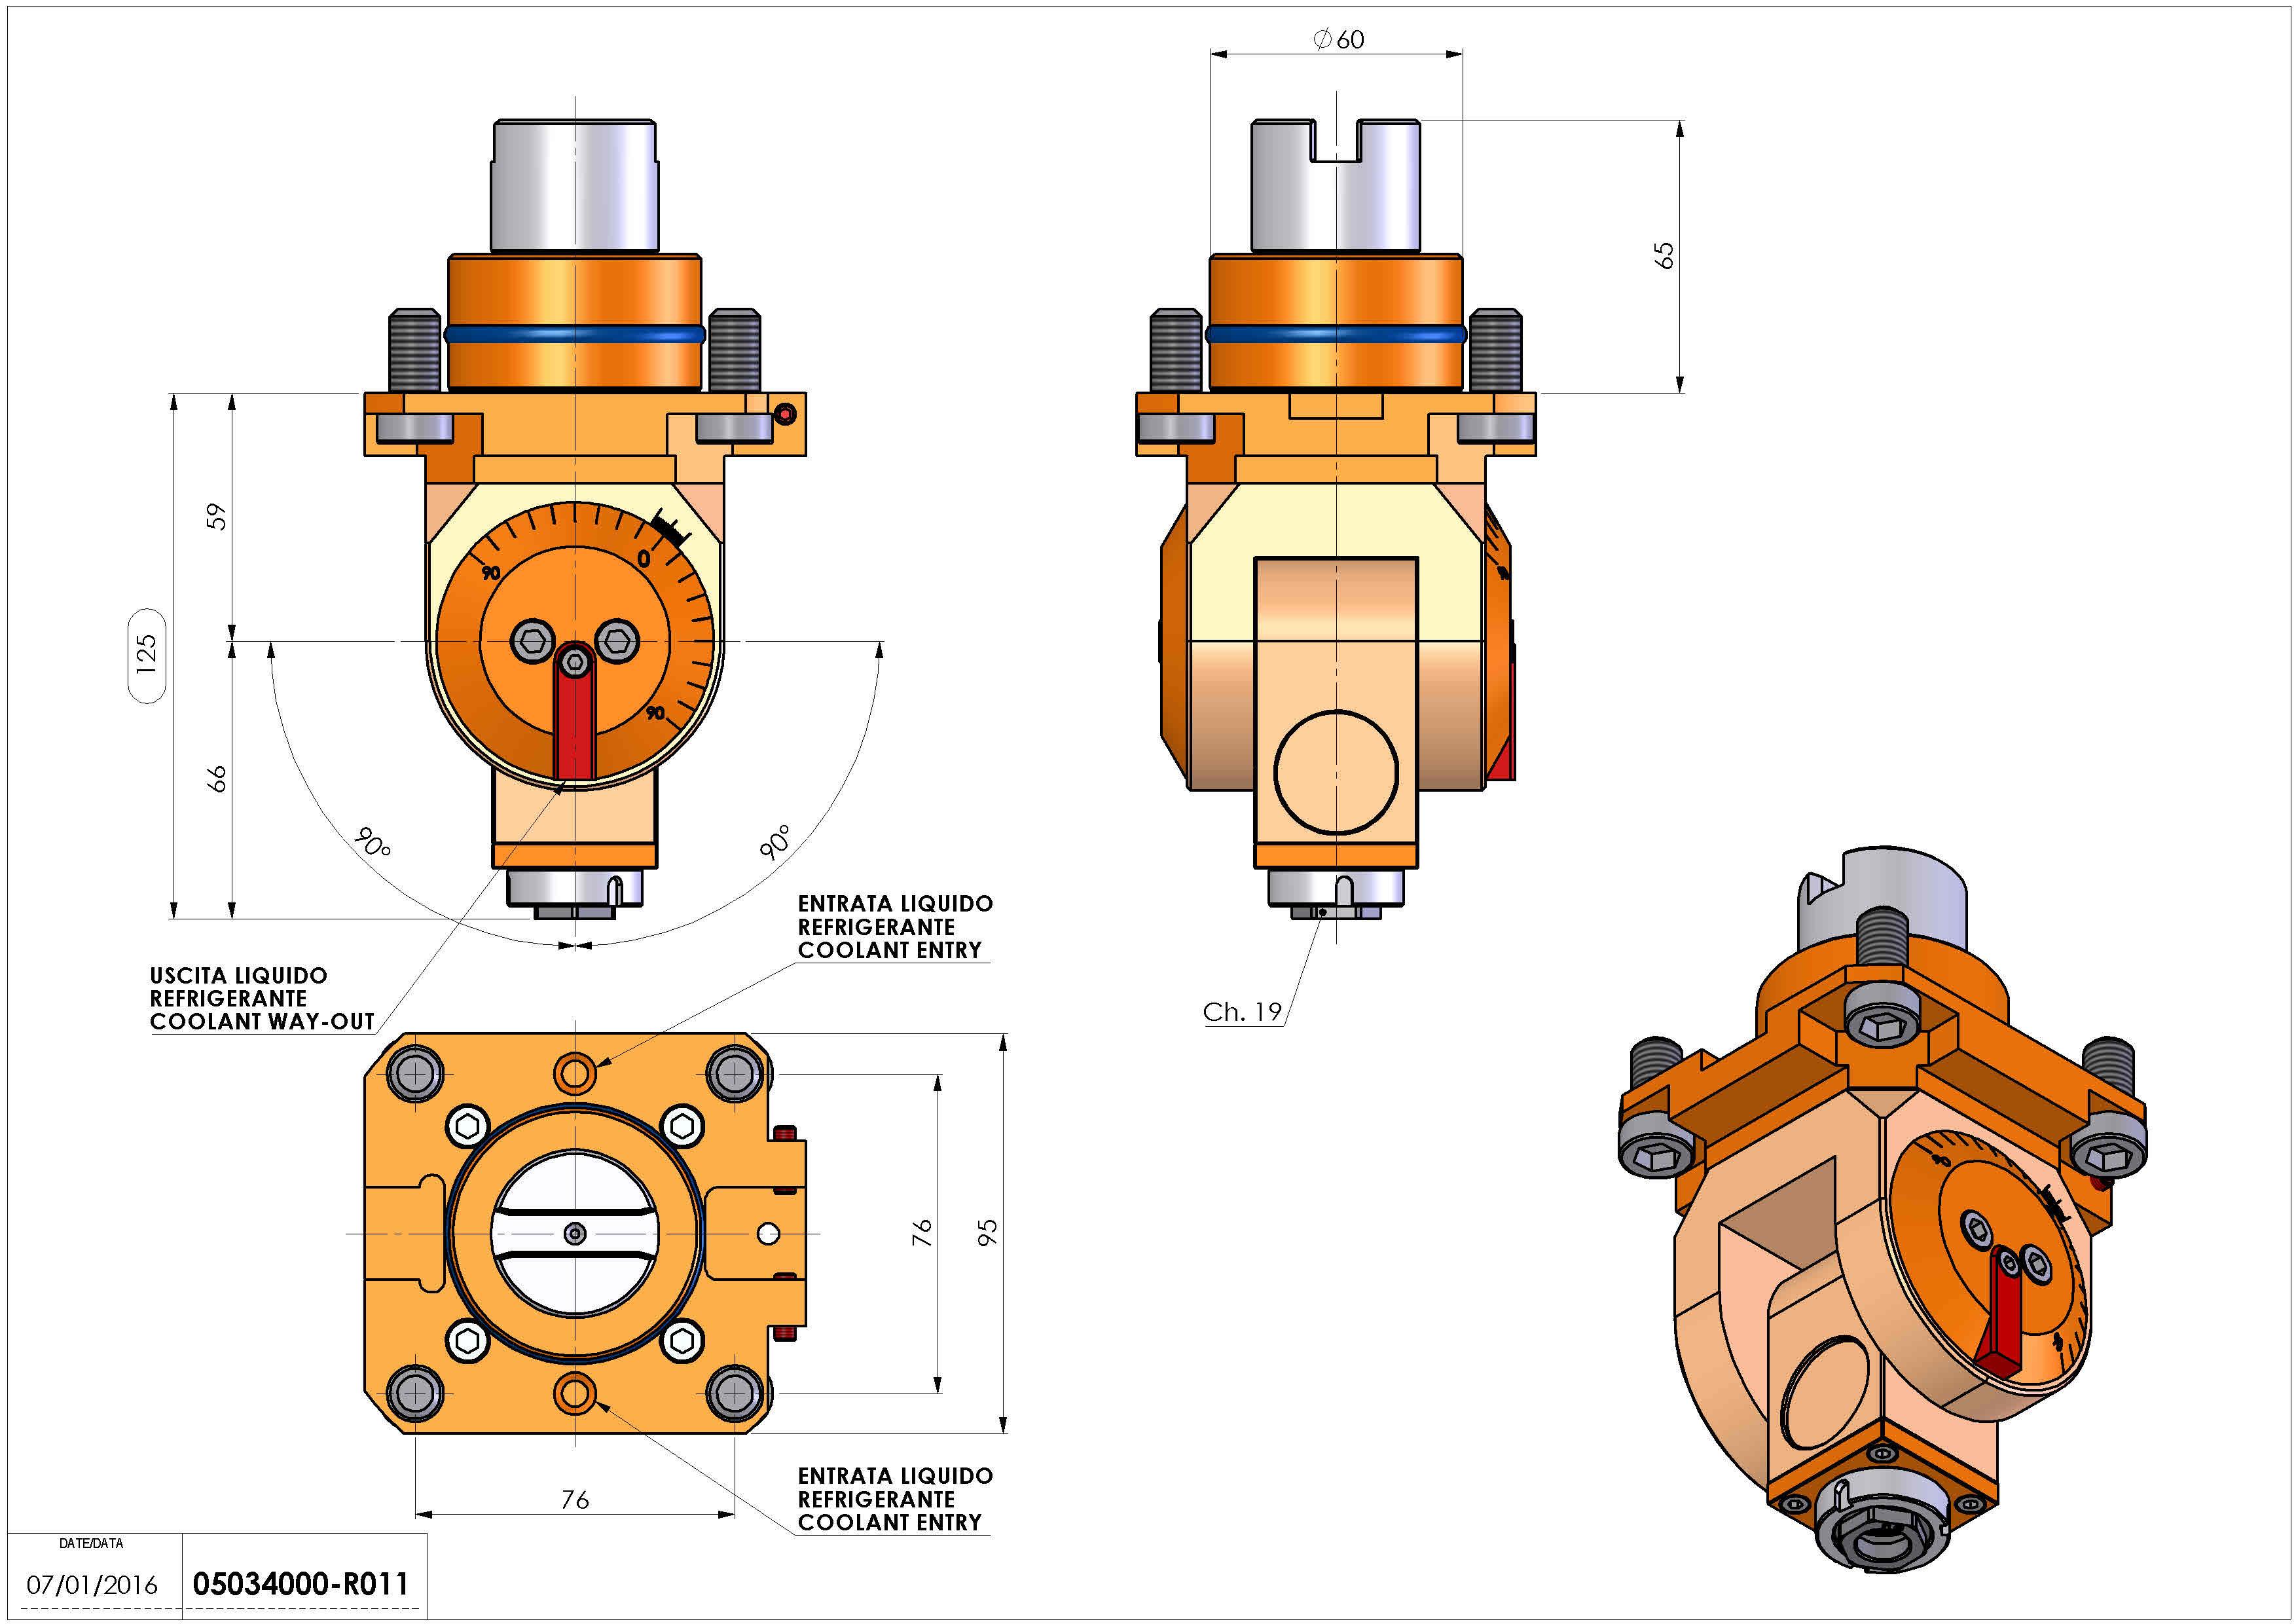 Technical image - LT-T D60 ER16F H59-128 TW.